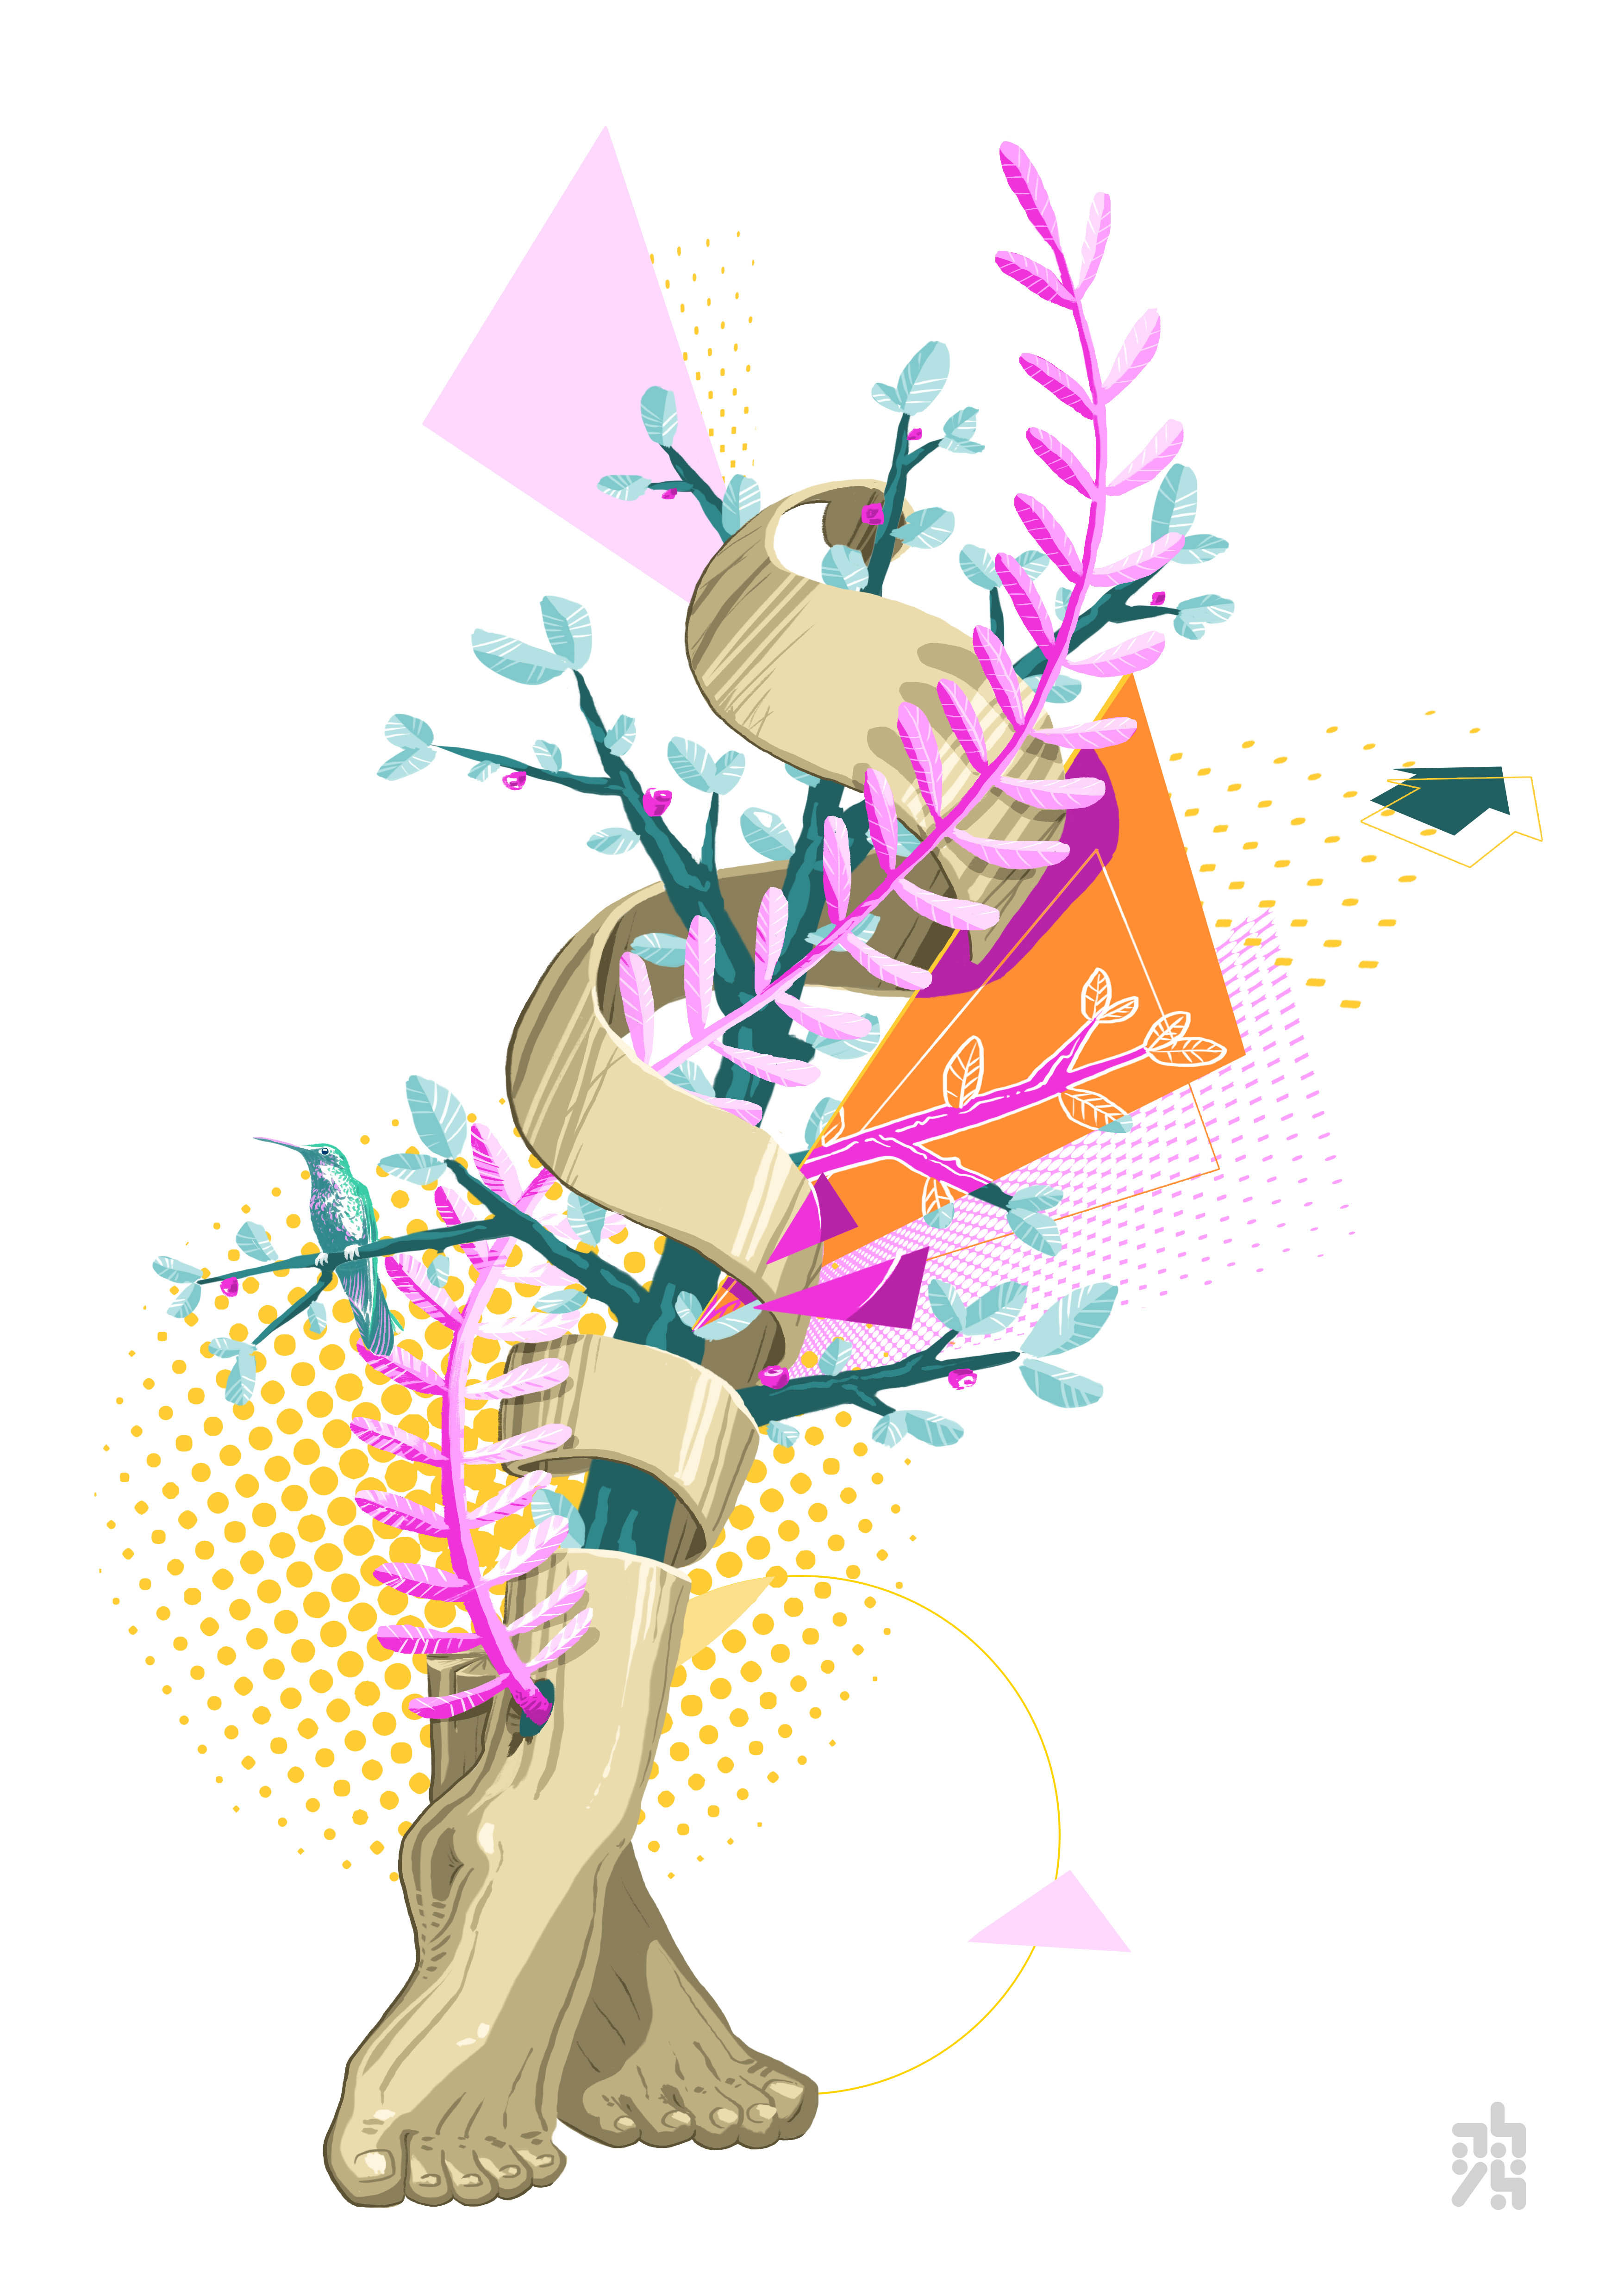 illustrateu - graphiste - abys digital painting lyon pied vegetal colibri